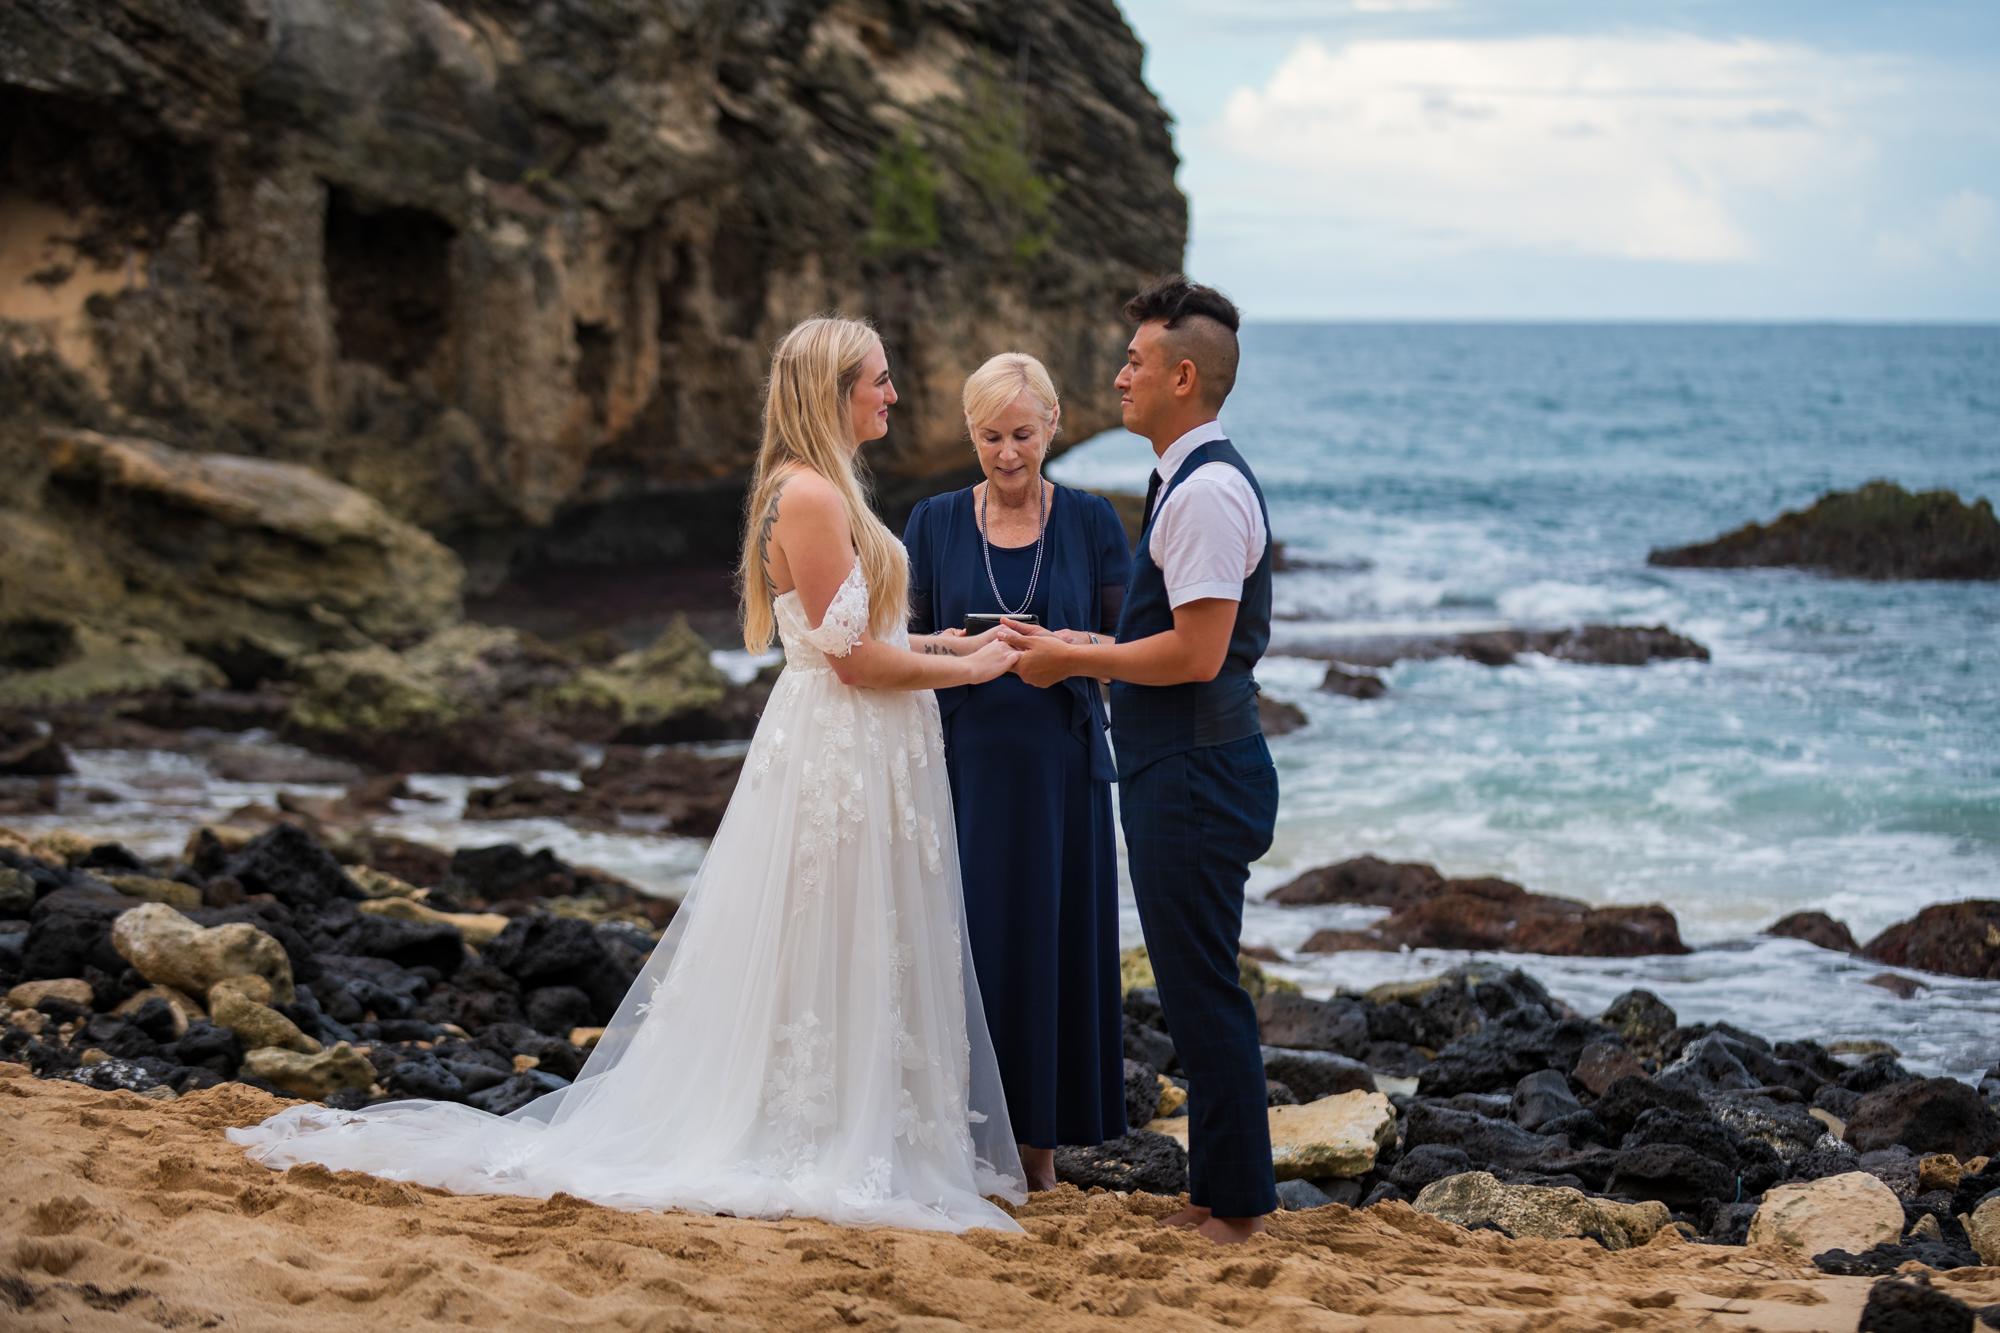 sunrise-wedding-coleen-shipwrecks-6-29-2919-9640.jpg